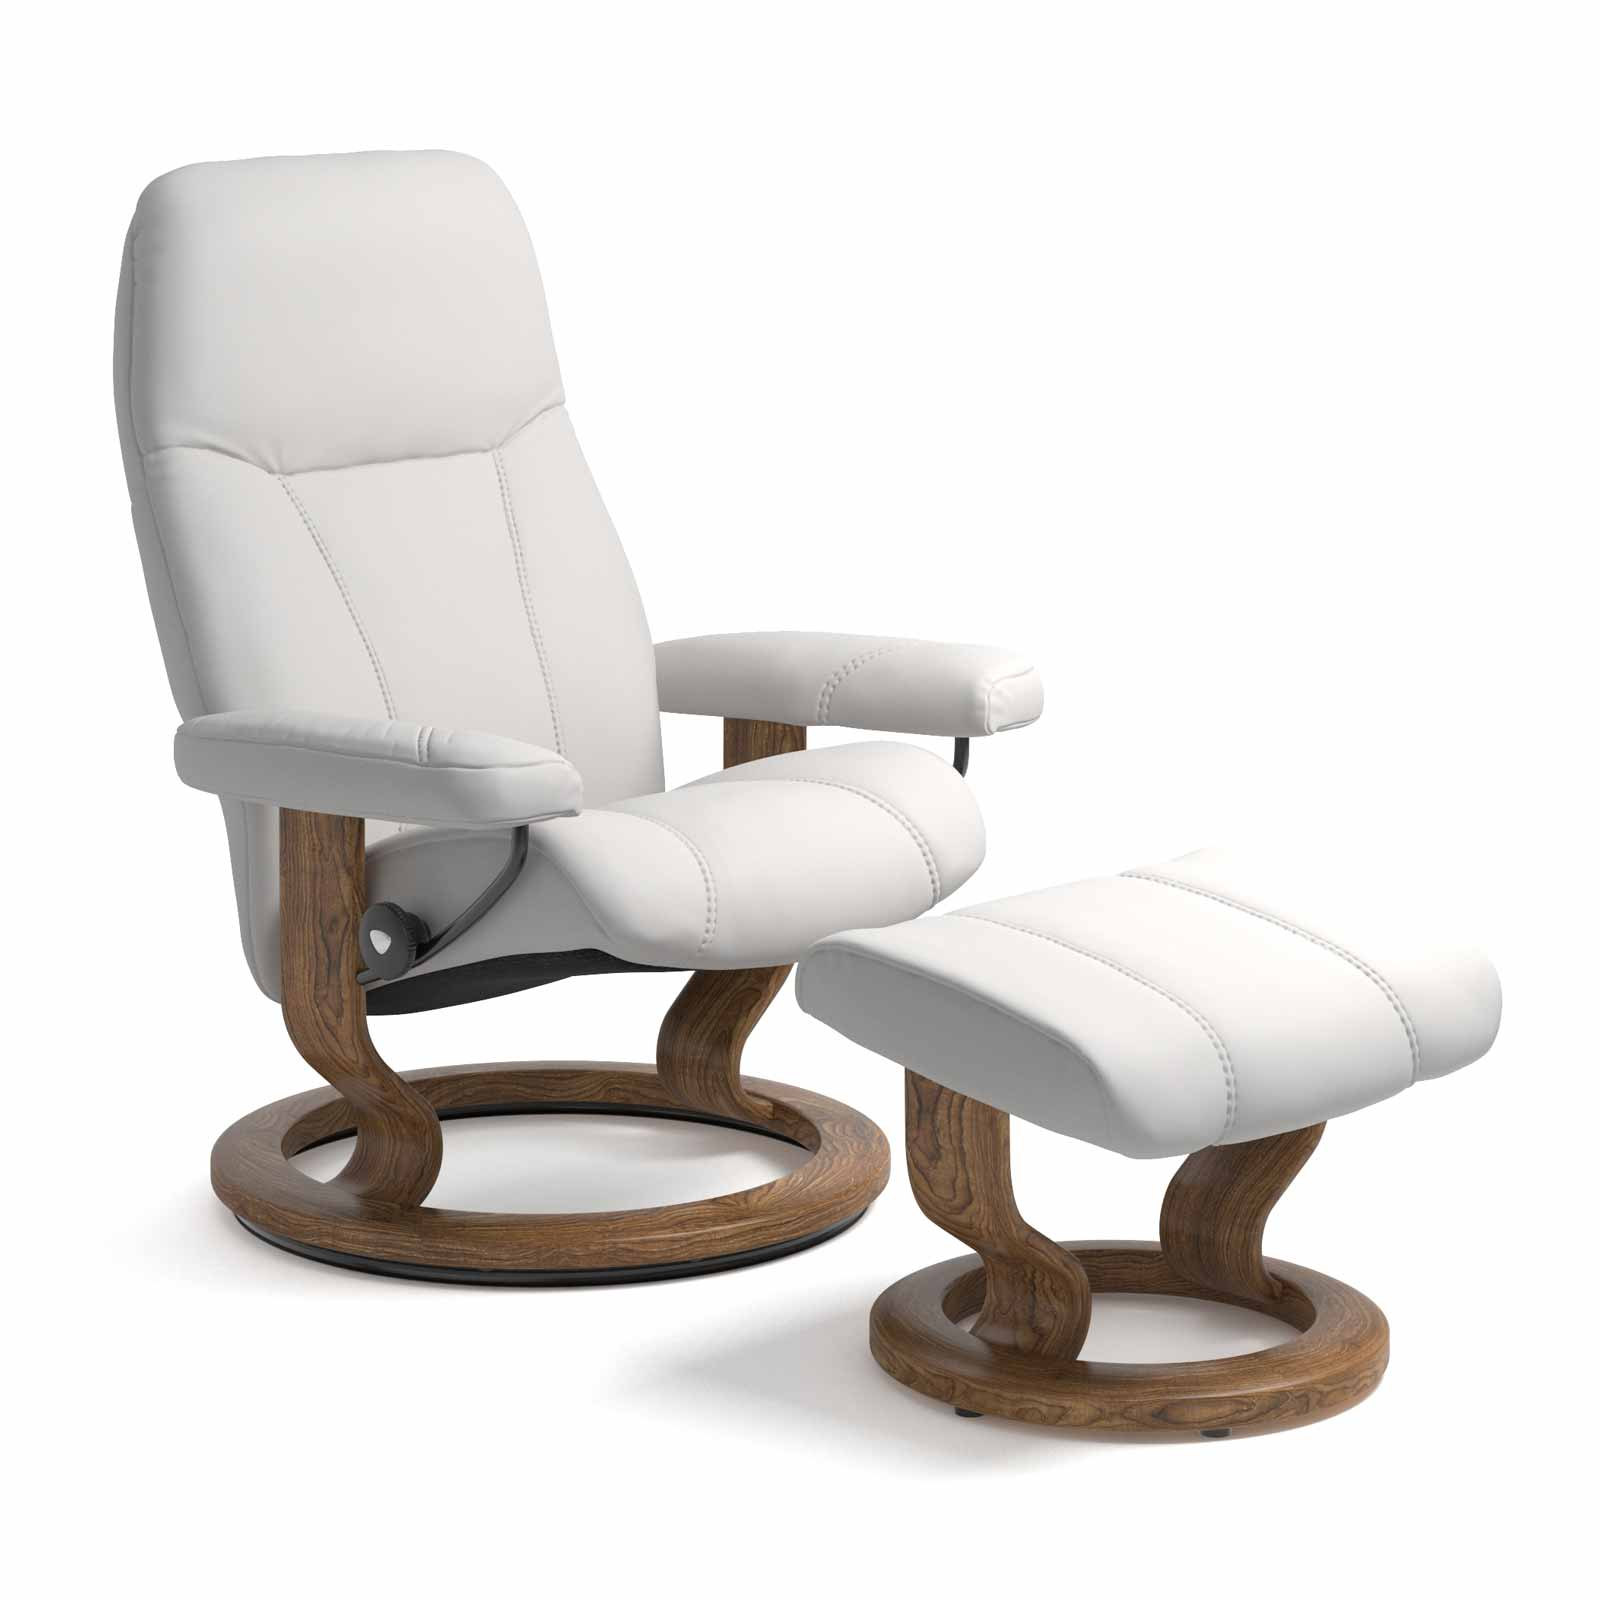 stressless consul classic batick snow mit hocker stressless. Black Bedroom Furniture Sets. Home Design Ideas